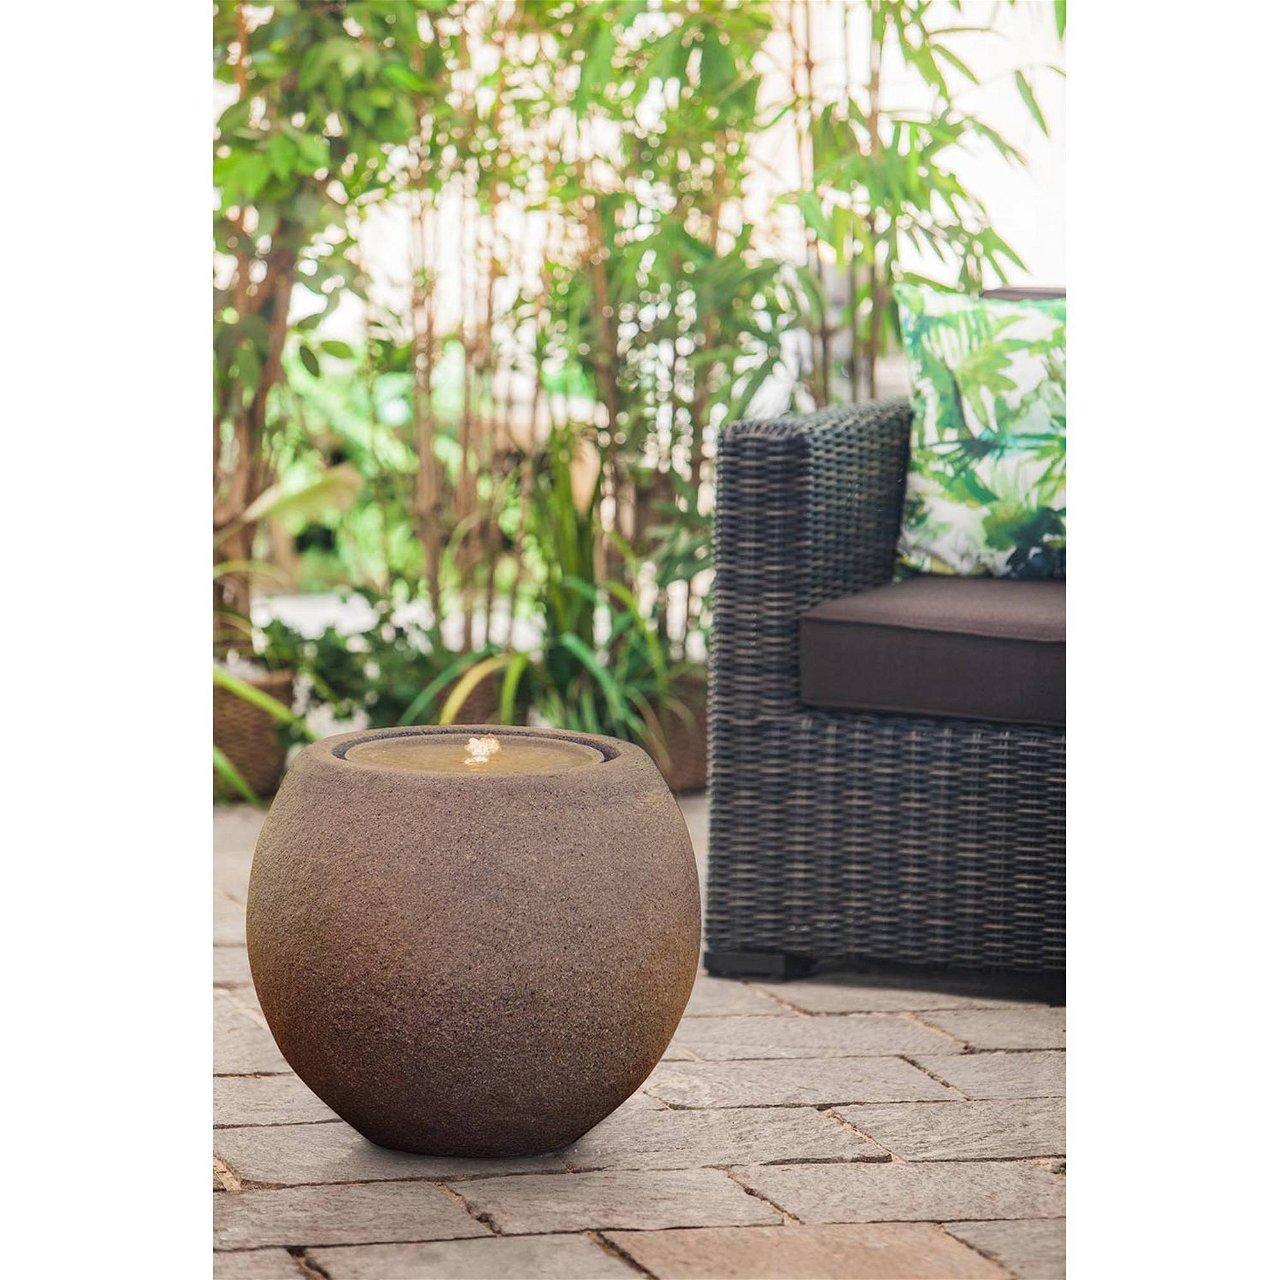 Heissner Gartenbrunnen Ball Terrakotta LED